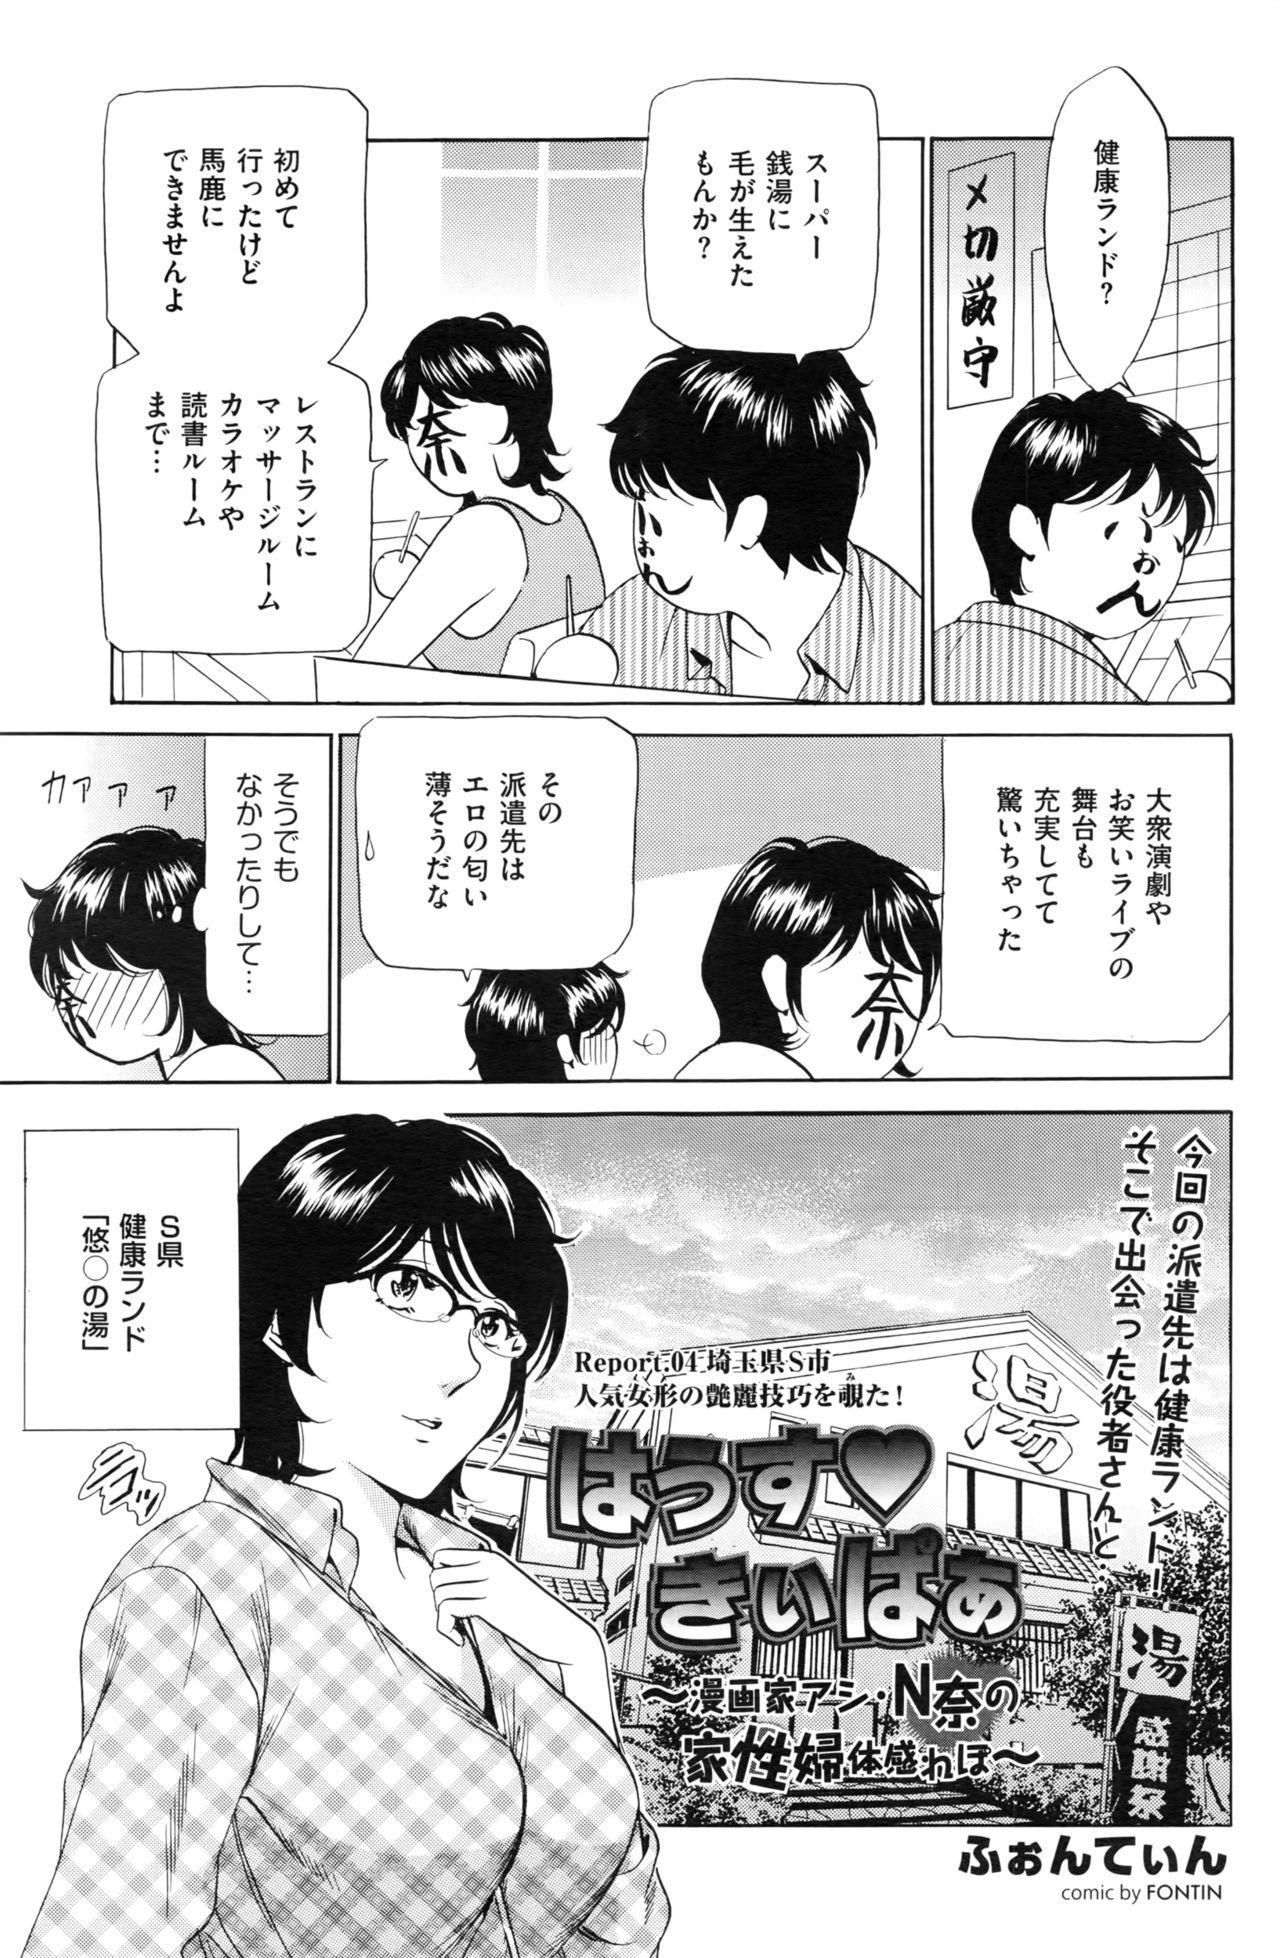 Wa Usuki Ipa a 1-10 55